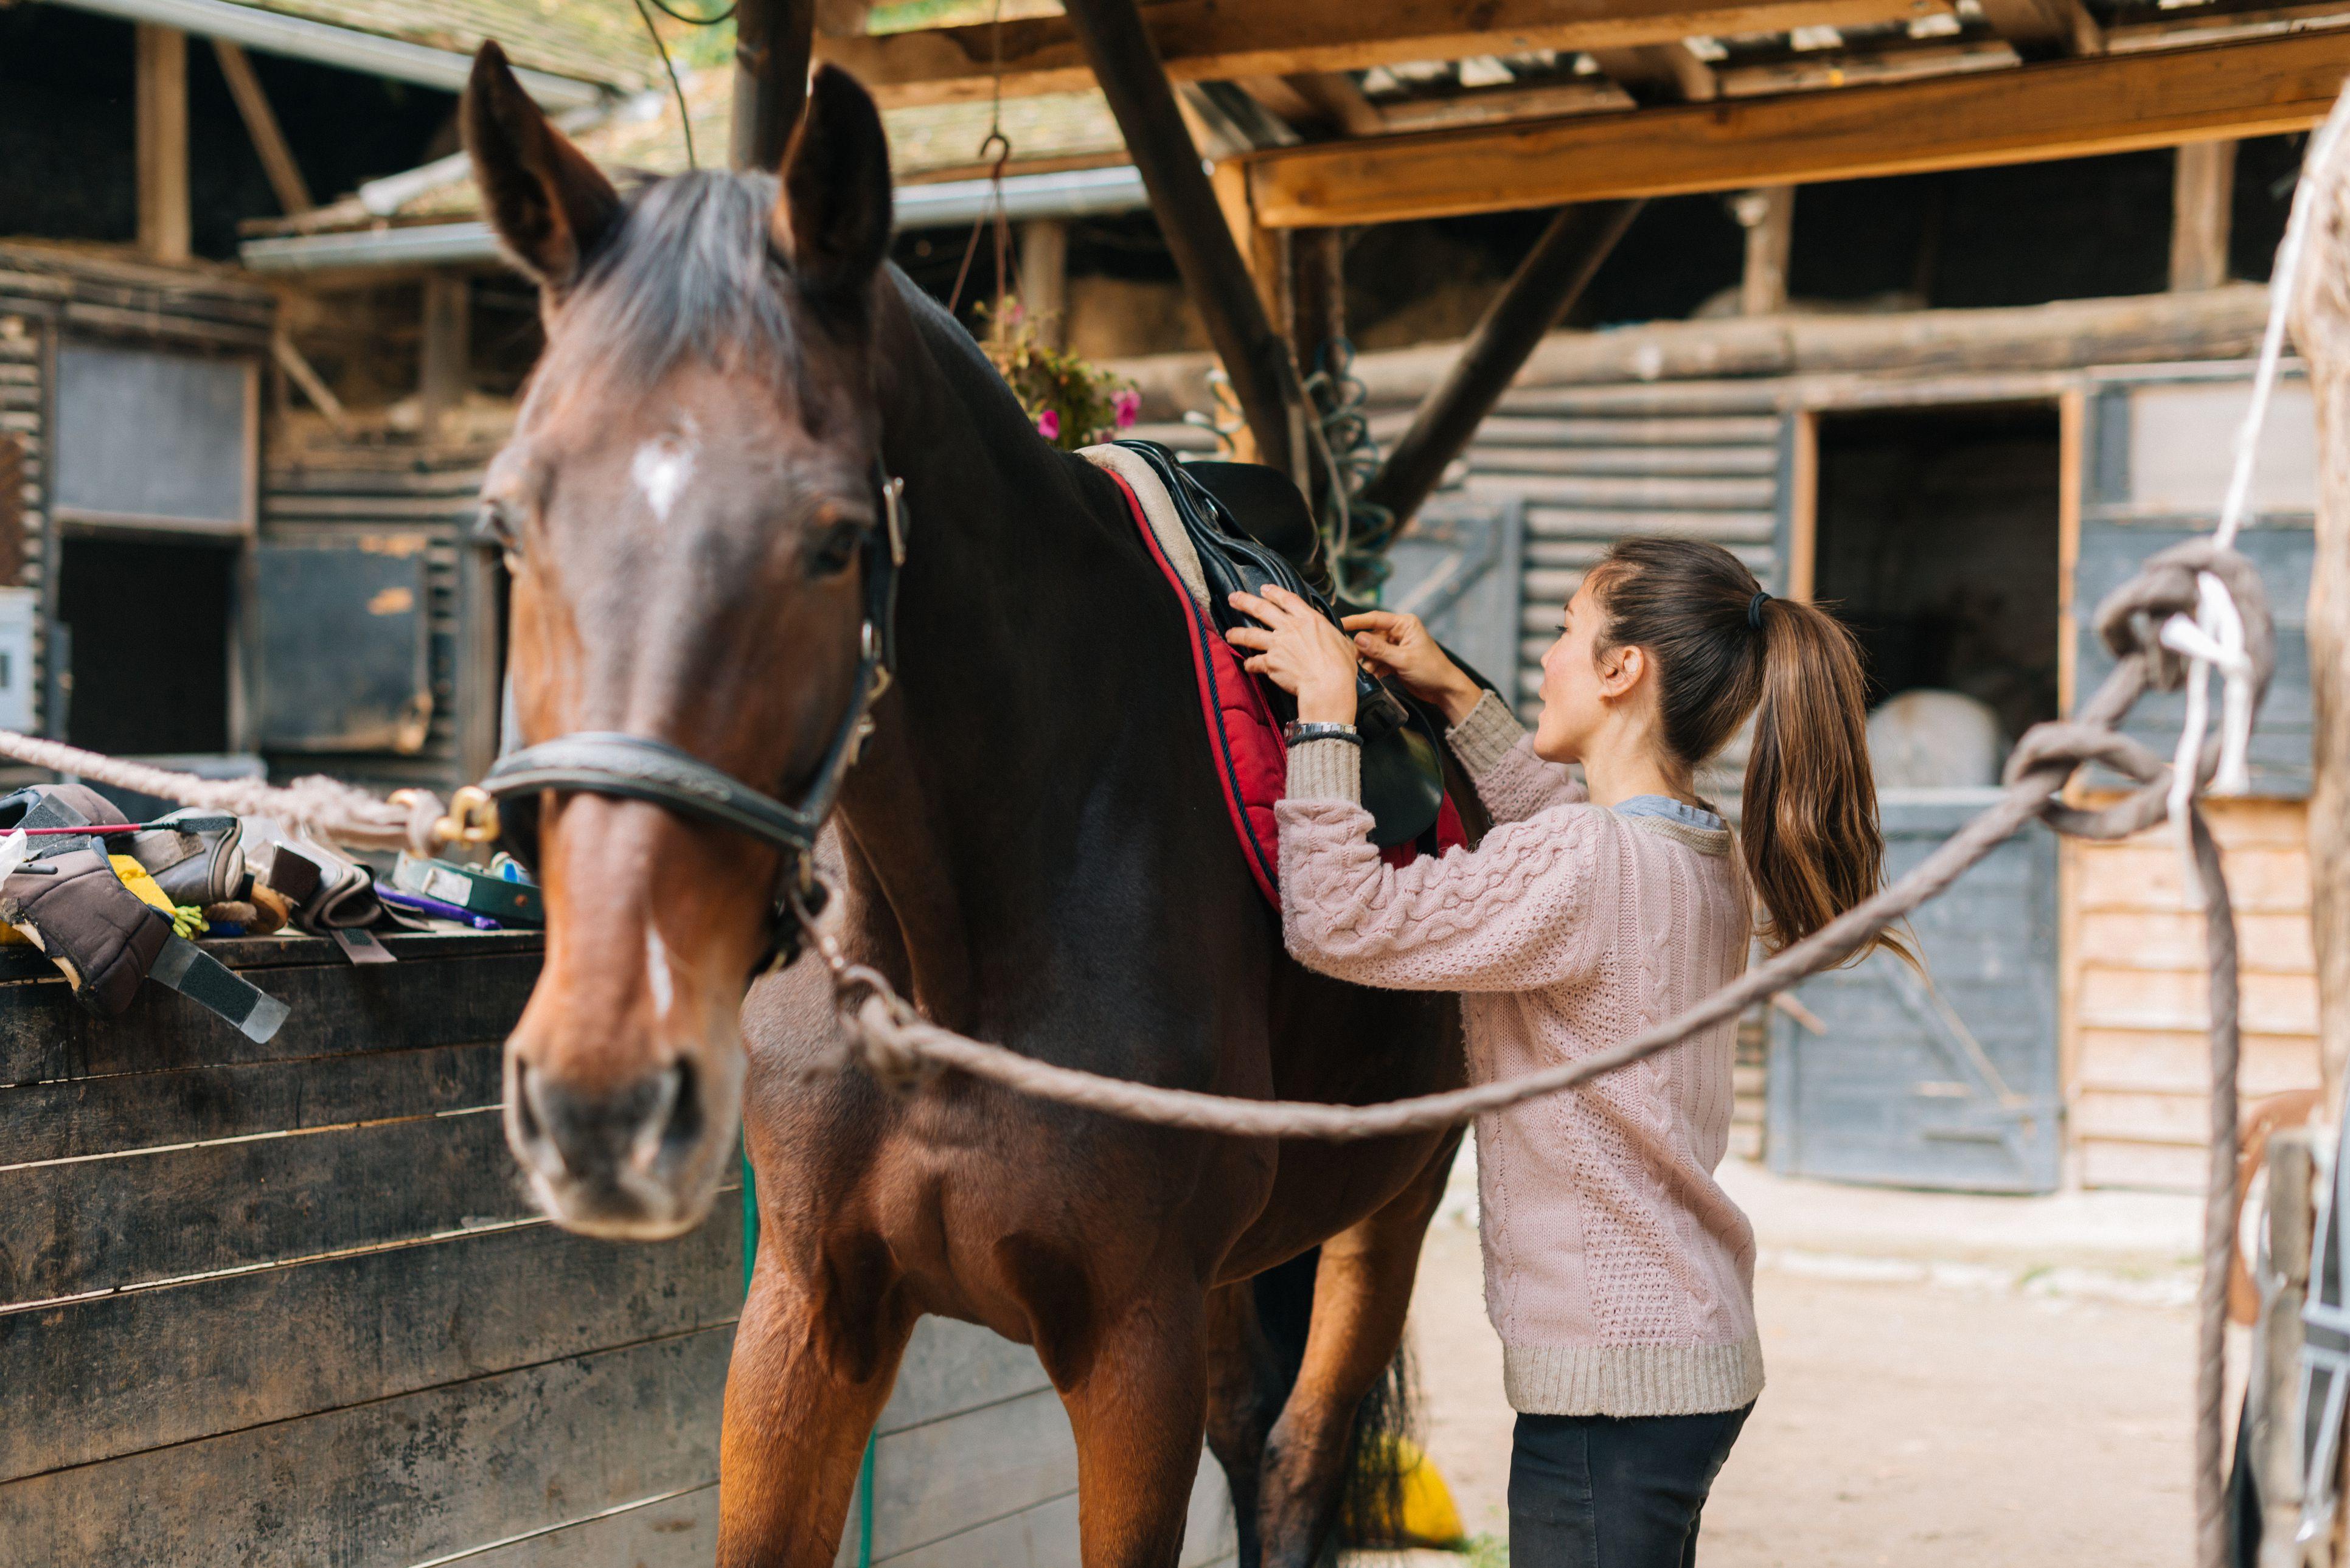 Rider putting saddle on her horse before dressage training